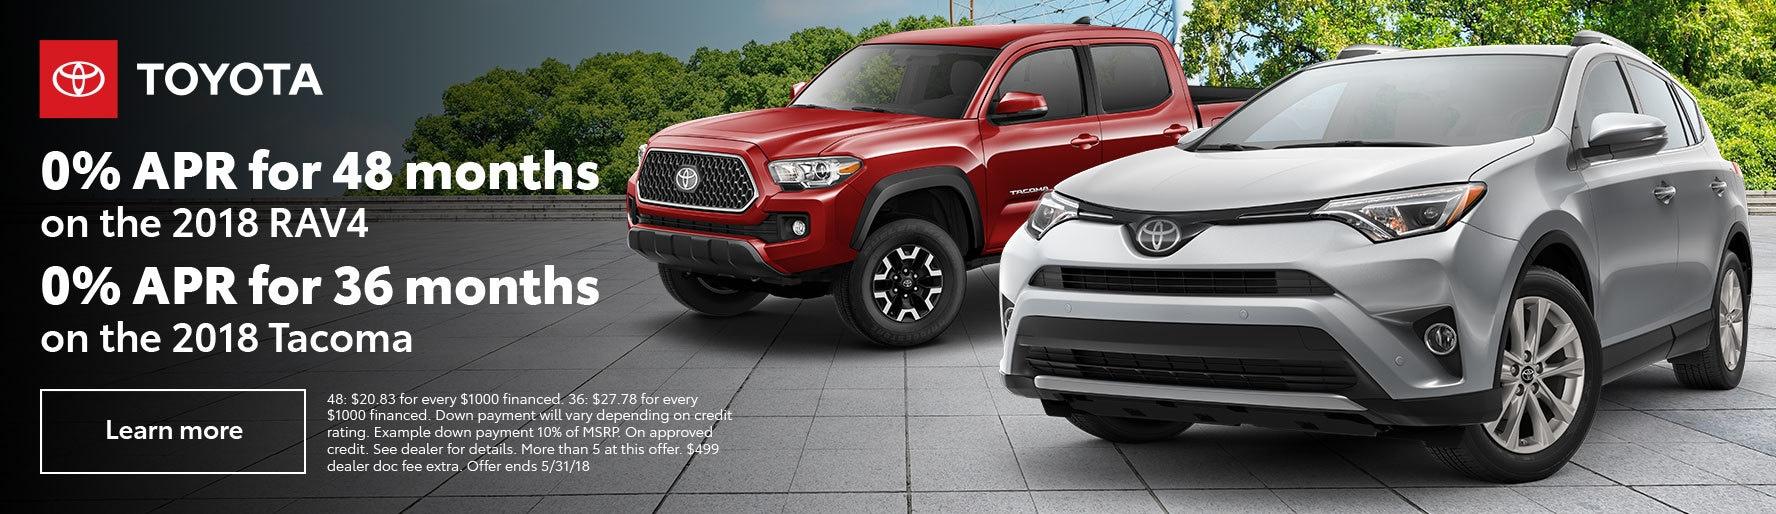 Brown Toyota Charlottesville >> Umansky Toyota | Charlottesville Car & Truck Dealership